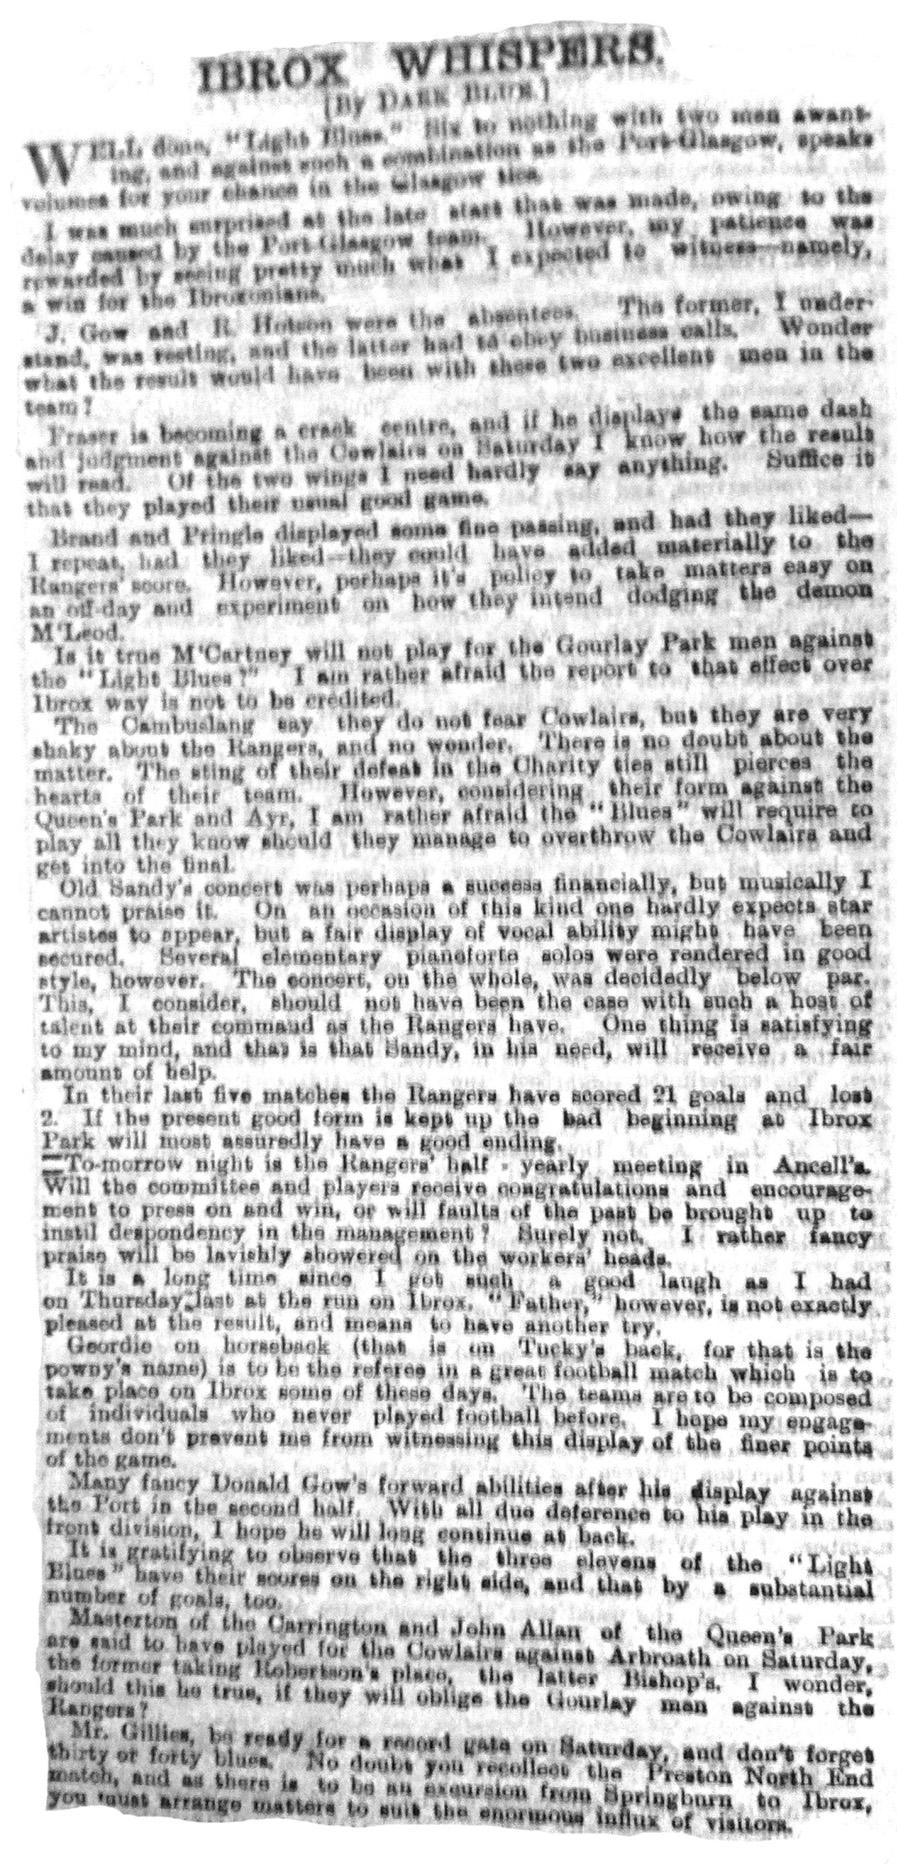 Ibrox whispers 1887 11 29.jpg